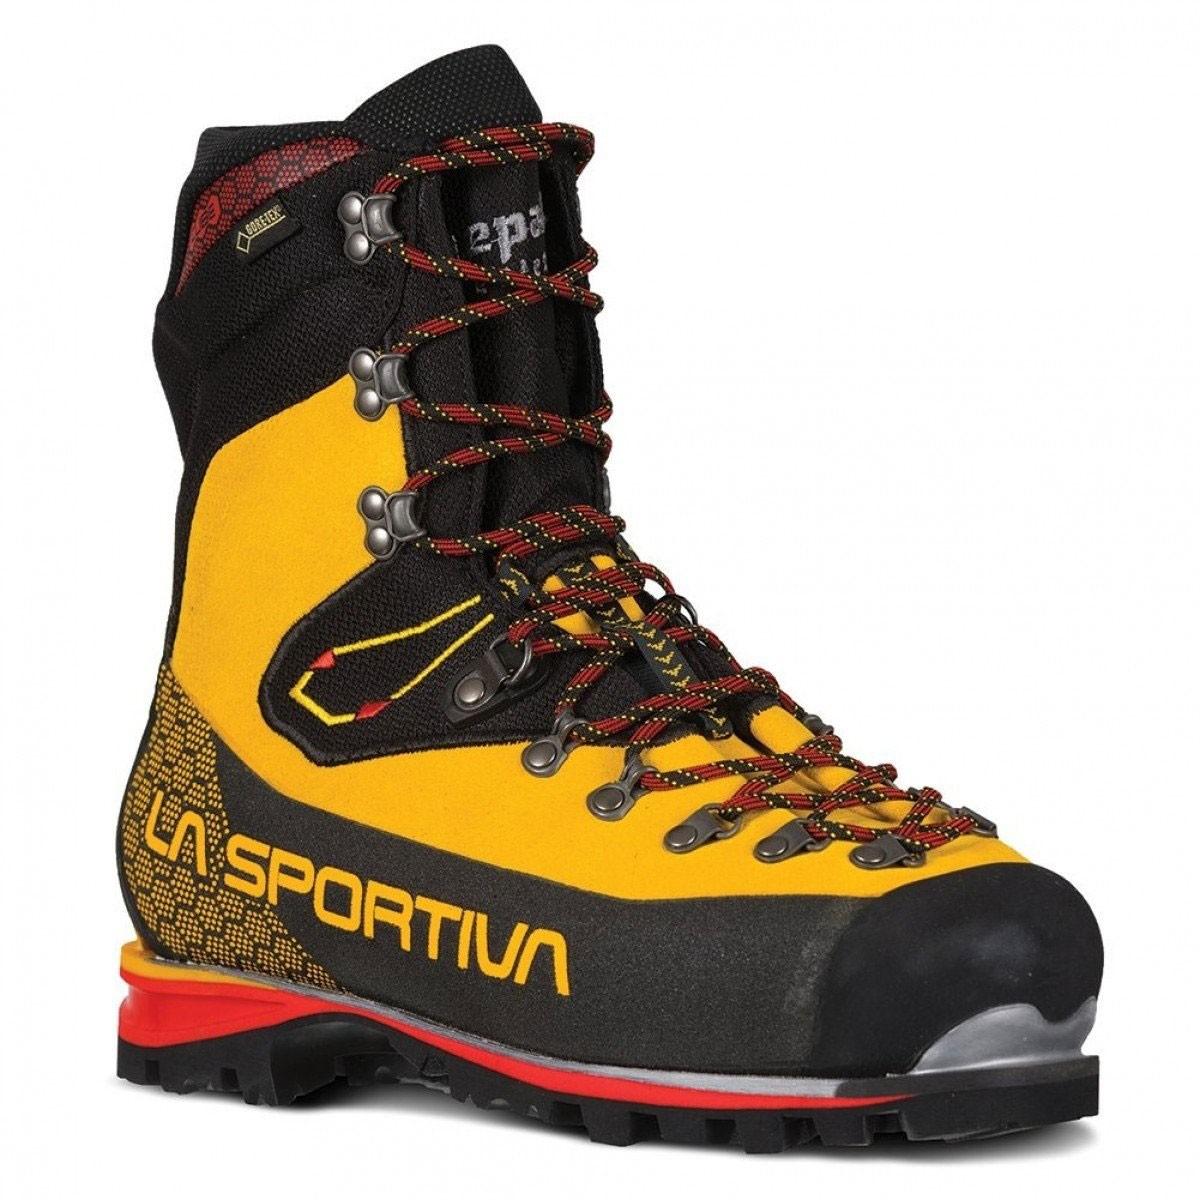 LA SPORTIVA - Nepal Cube GTX Mountaineering Boots